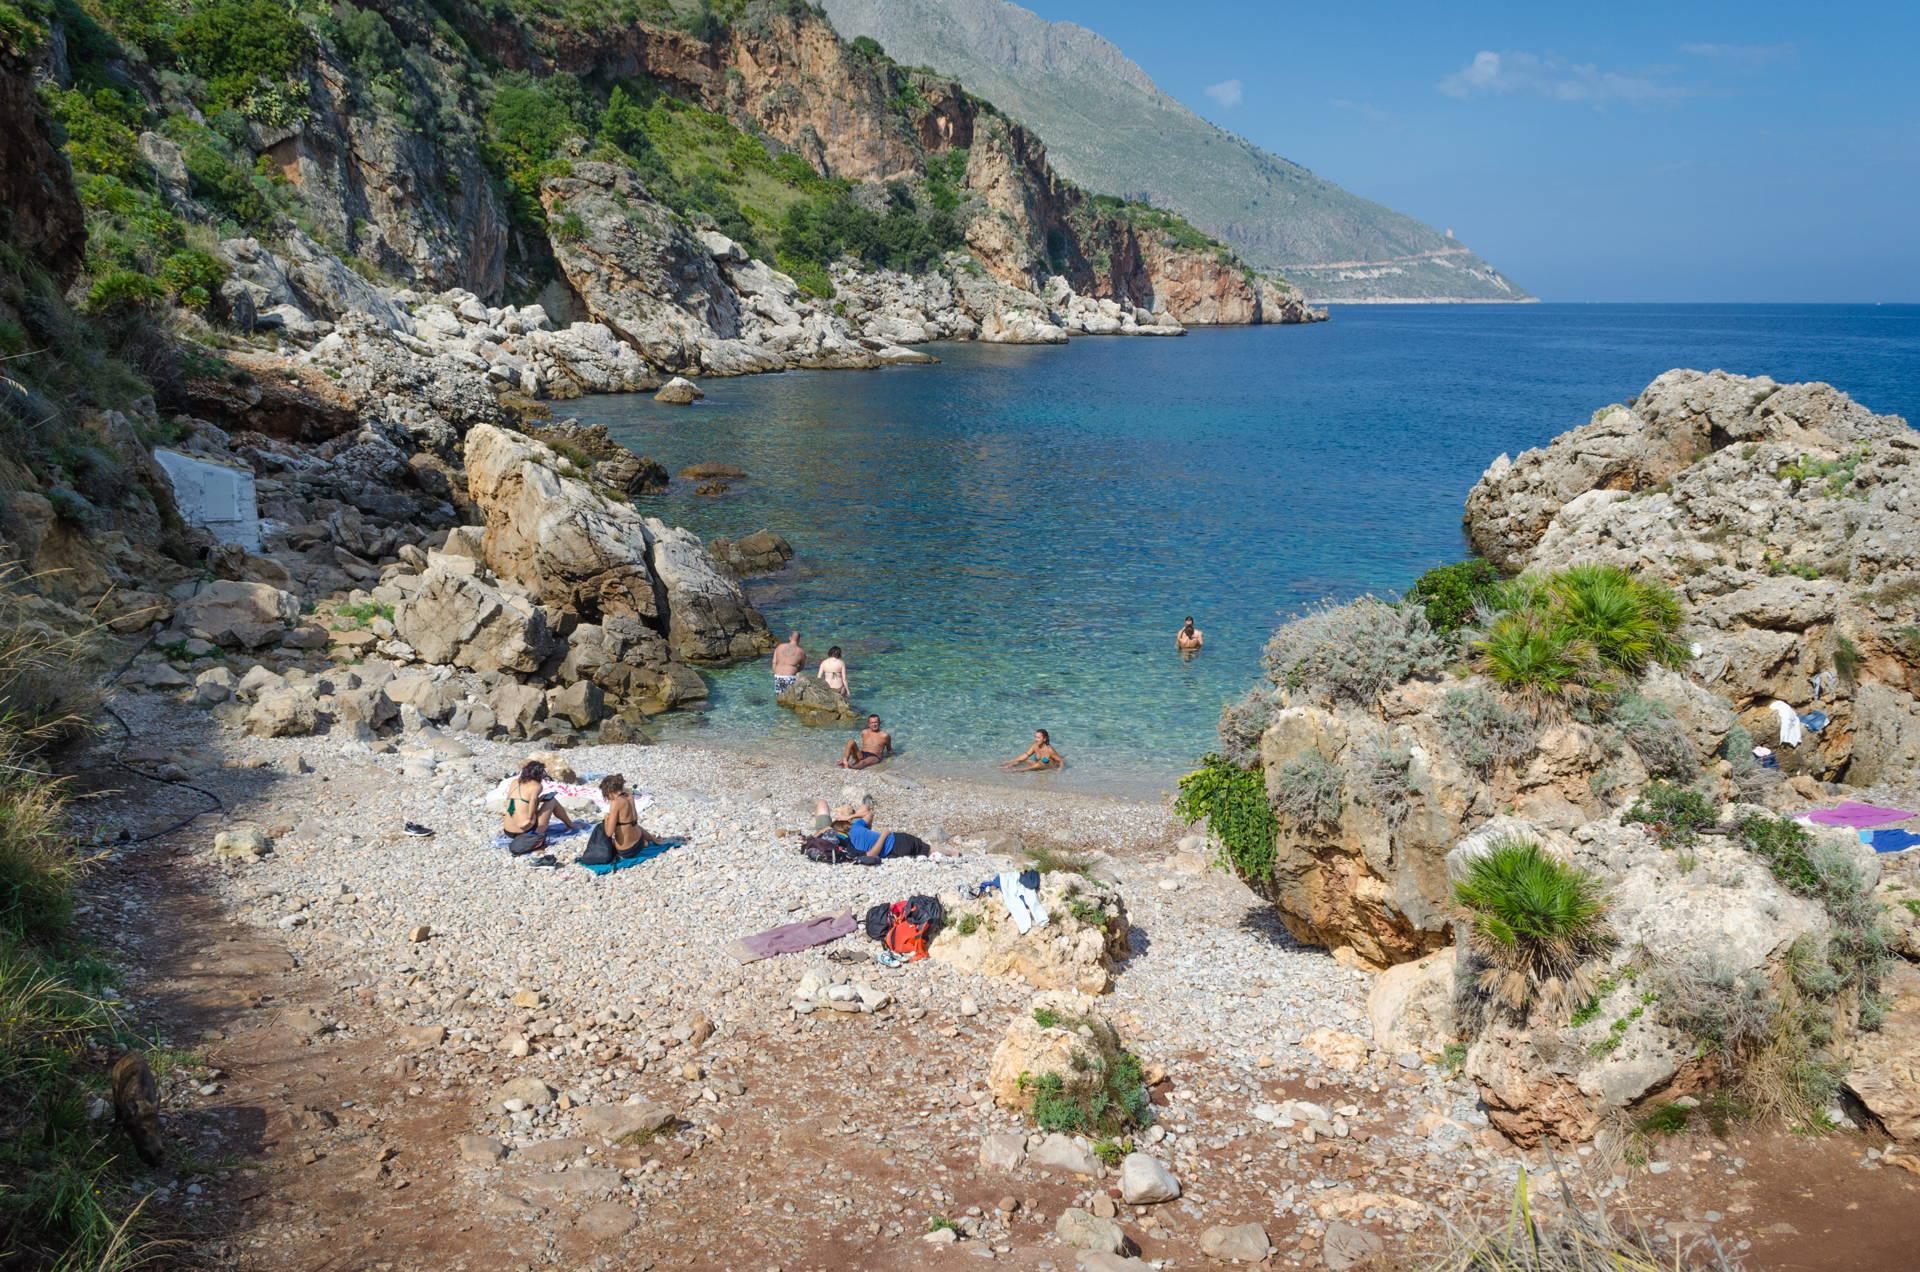 cala berretta, berretta beach. zingaro berretta, zingaro nature reserve berretta, best beach of zingaro, beach guide zingaro, sicily, best beaches of sicily